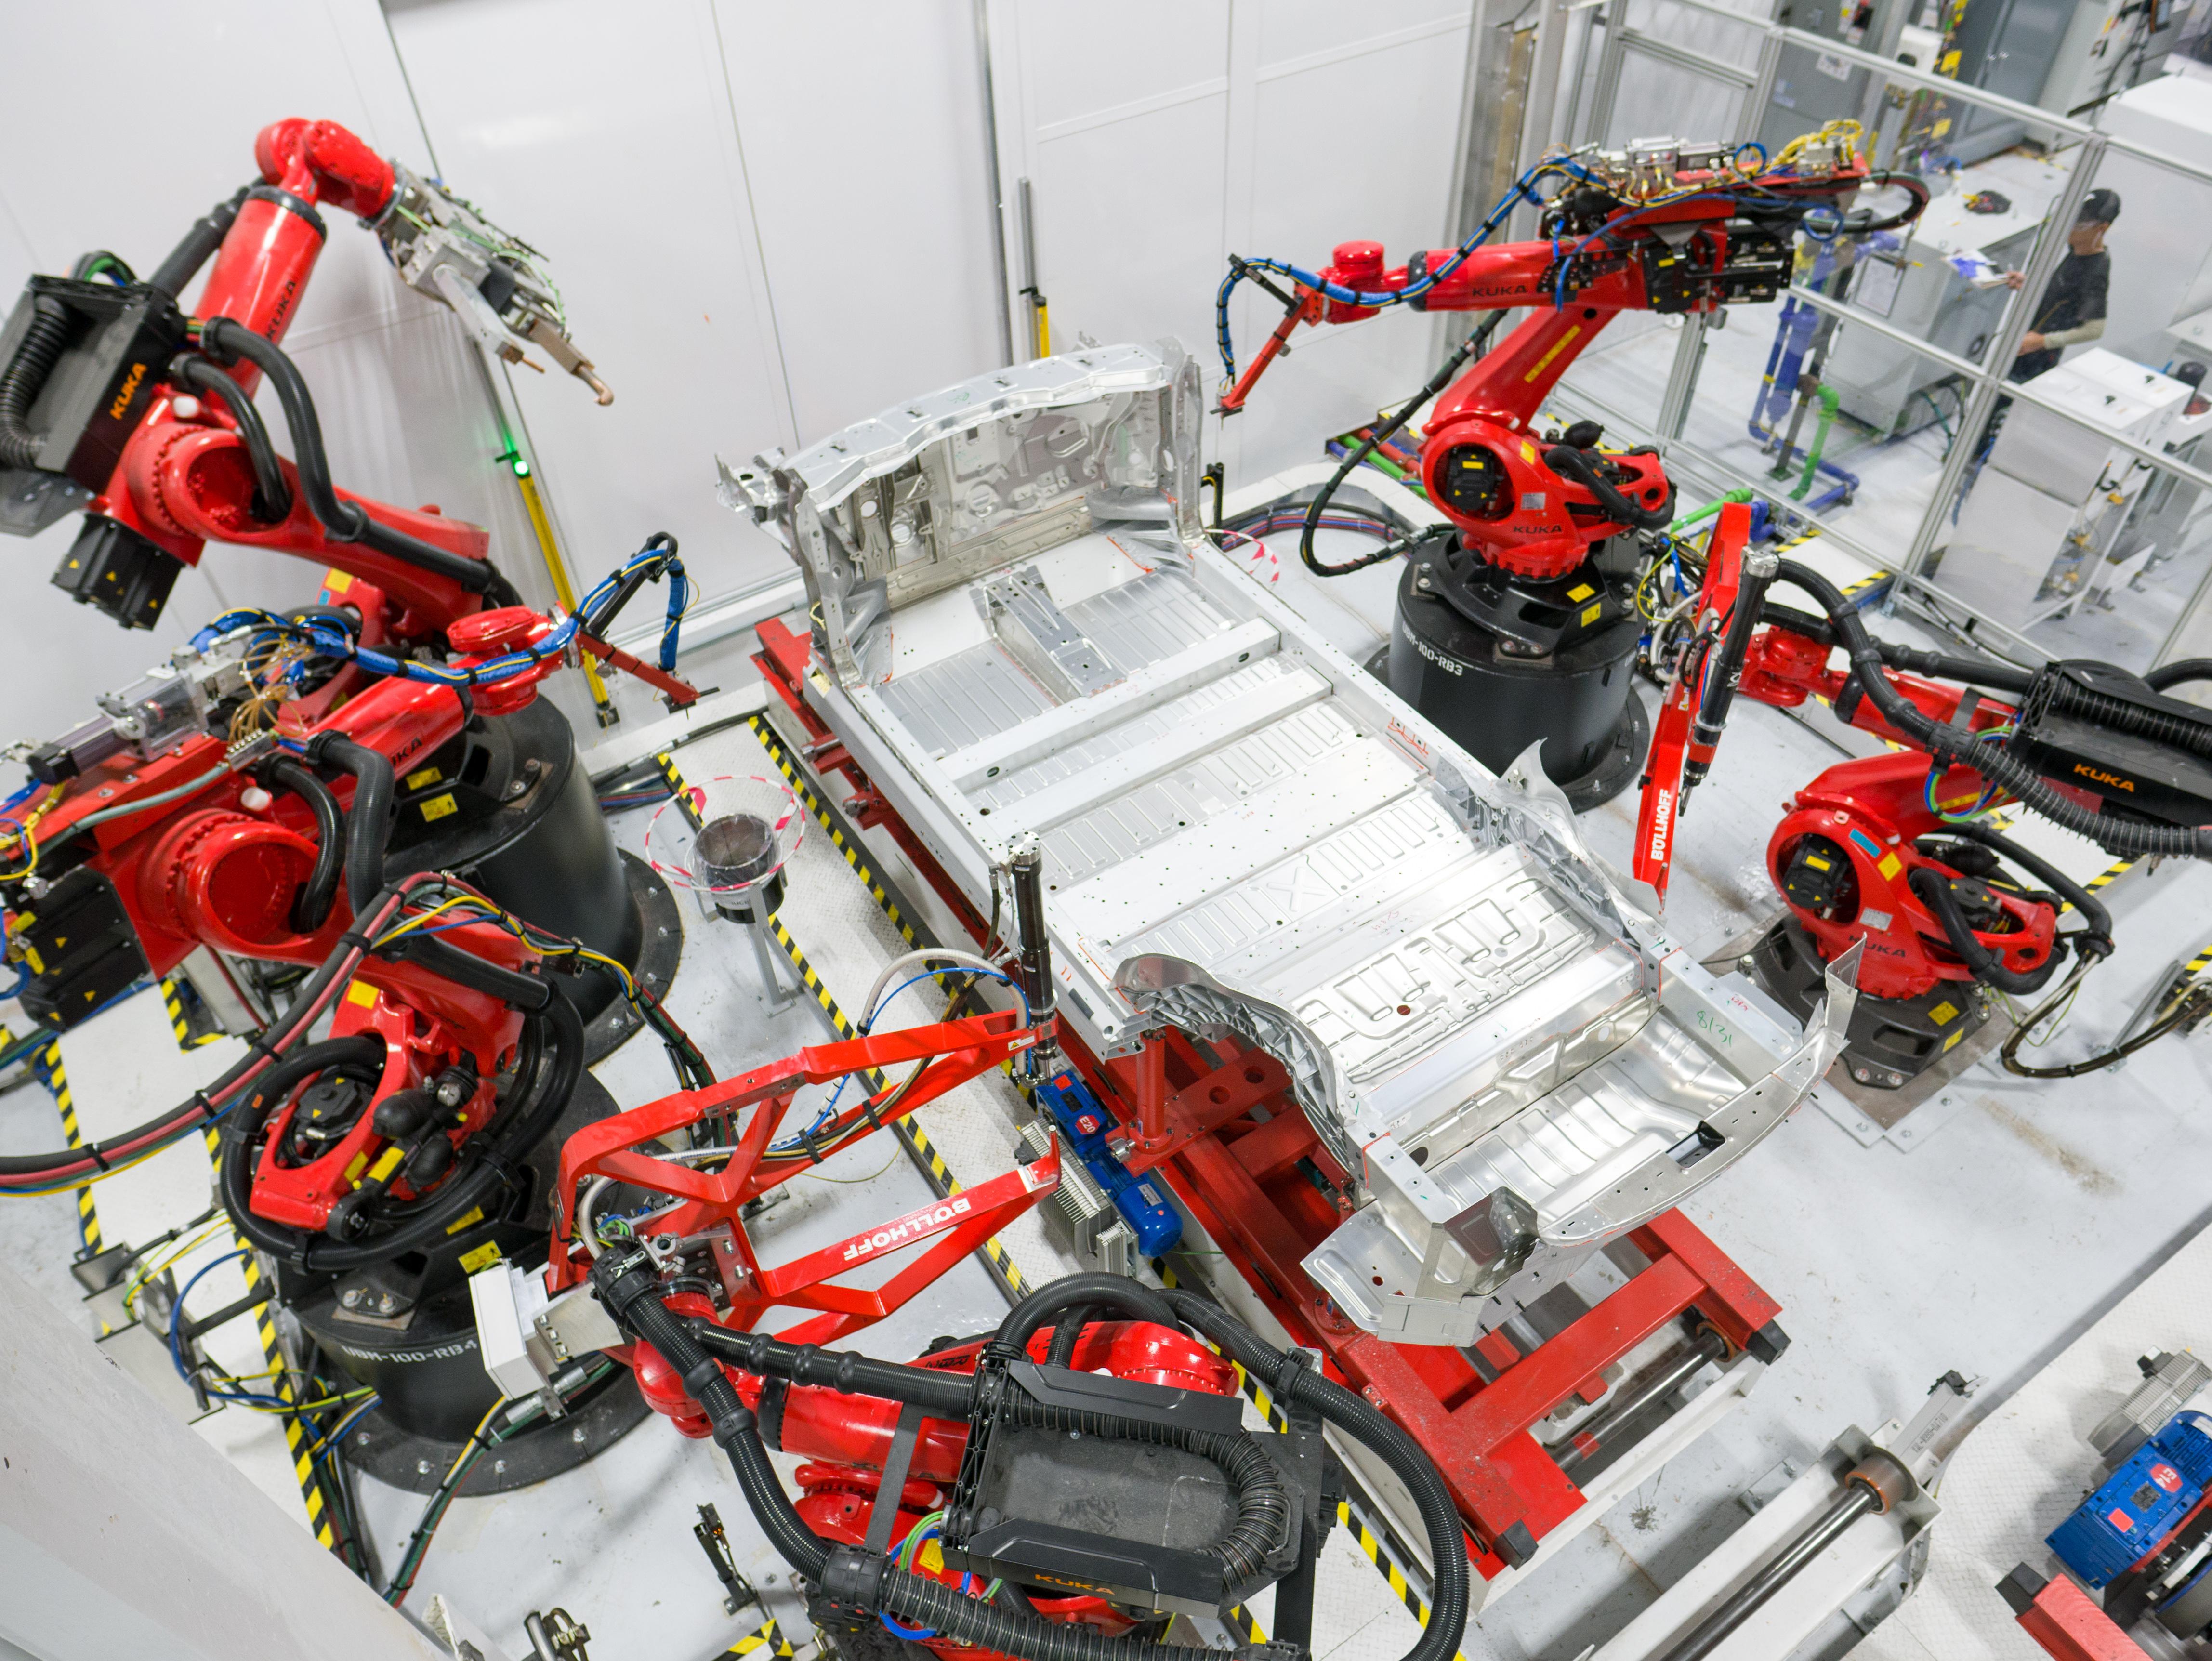 Assembly begins on a Tesla vehicle.